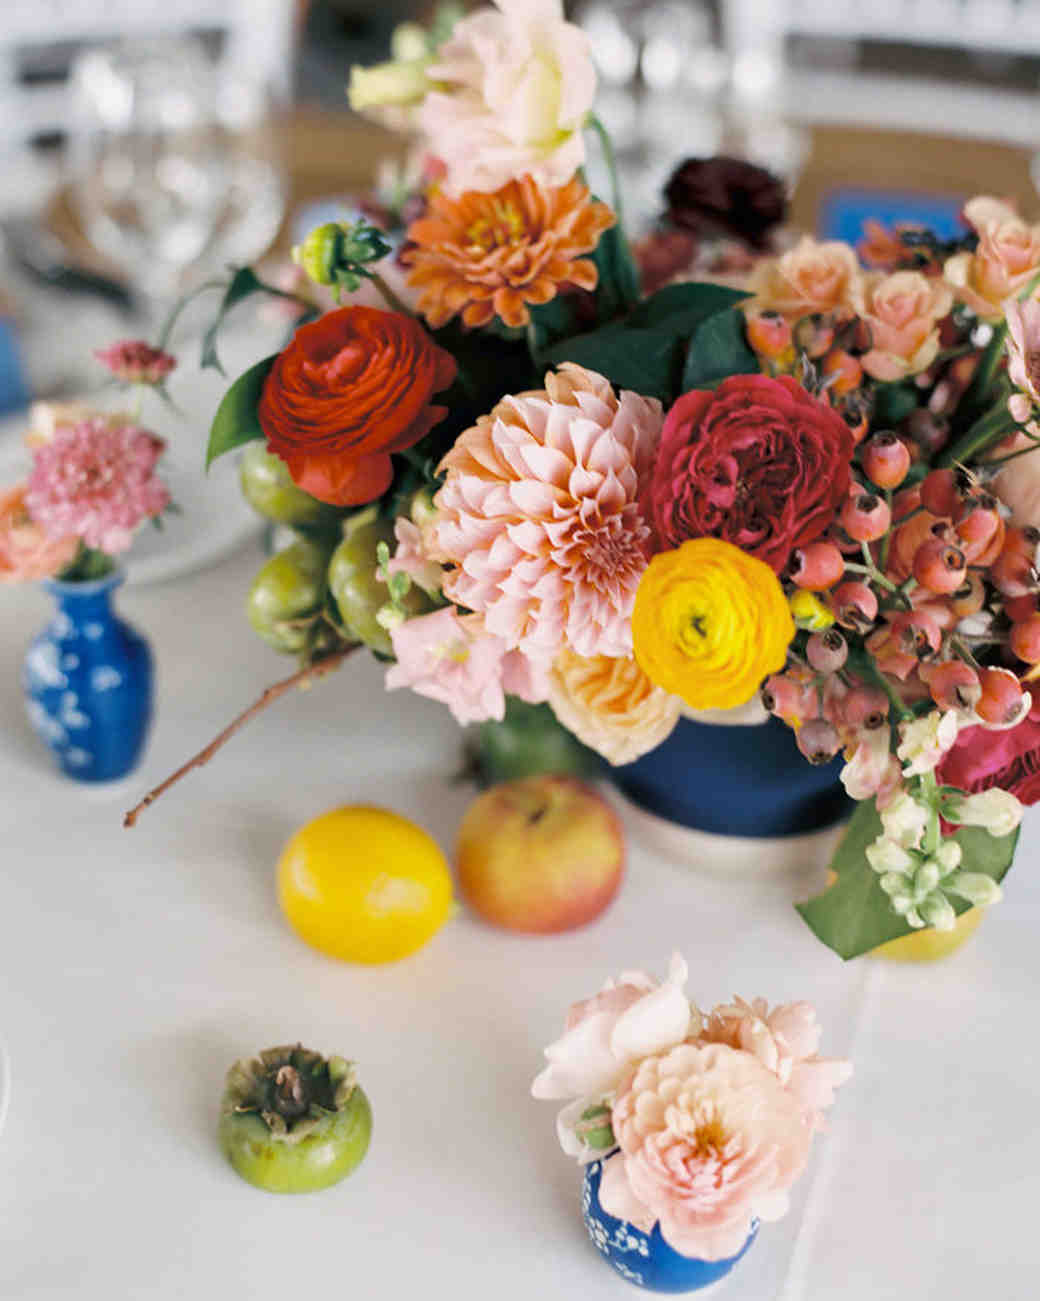 dahlia wedding centerpieces colorful prema arrangement